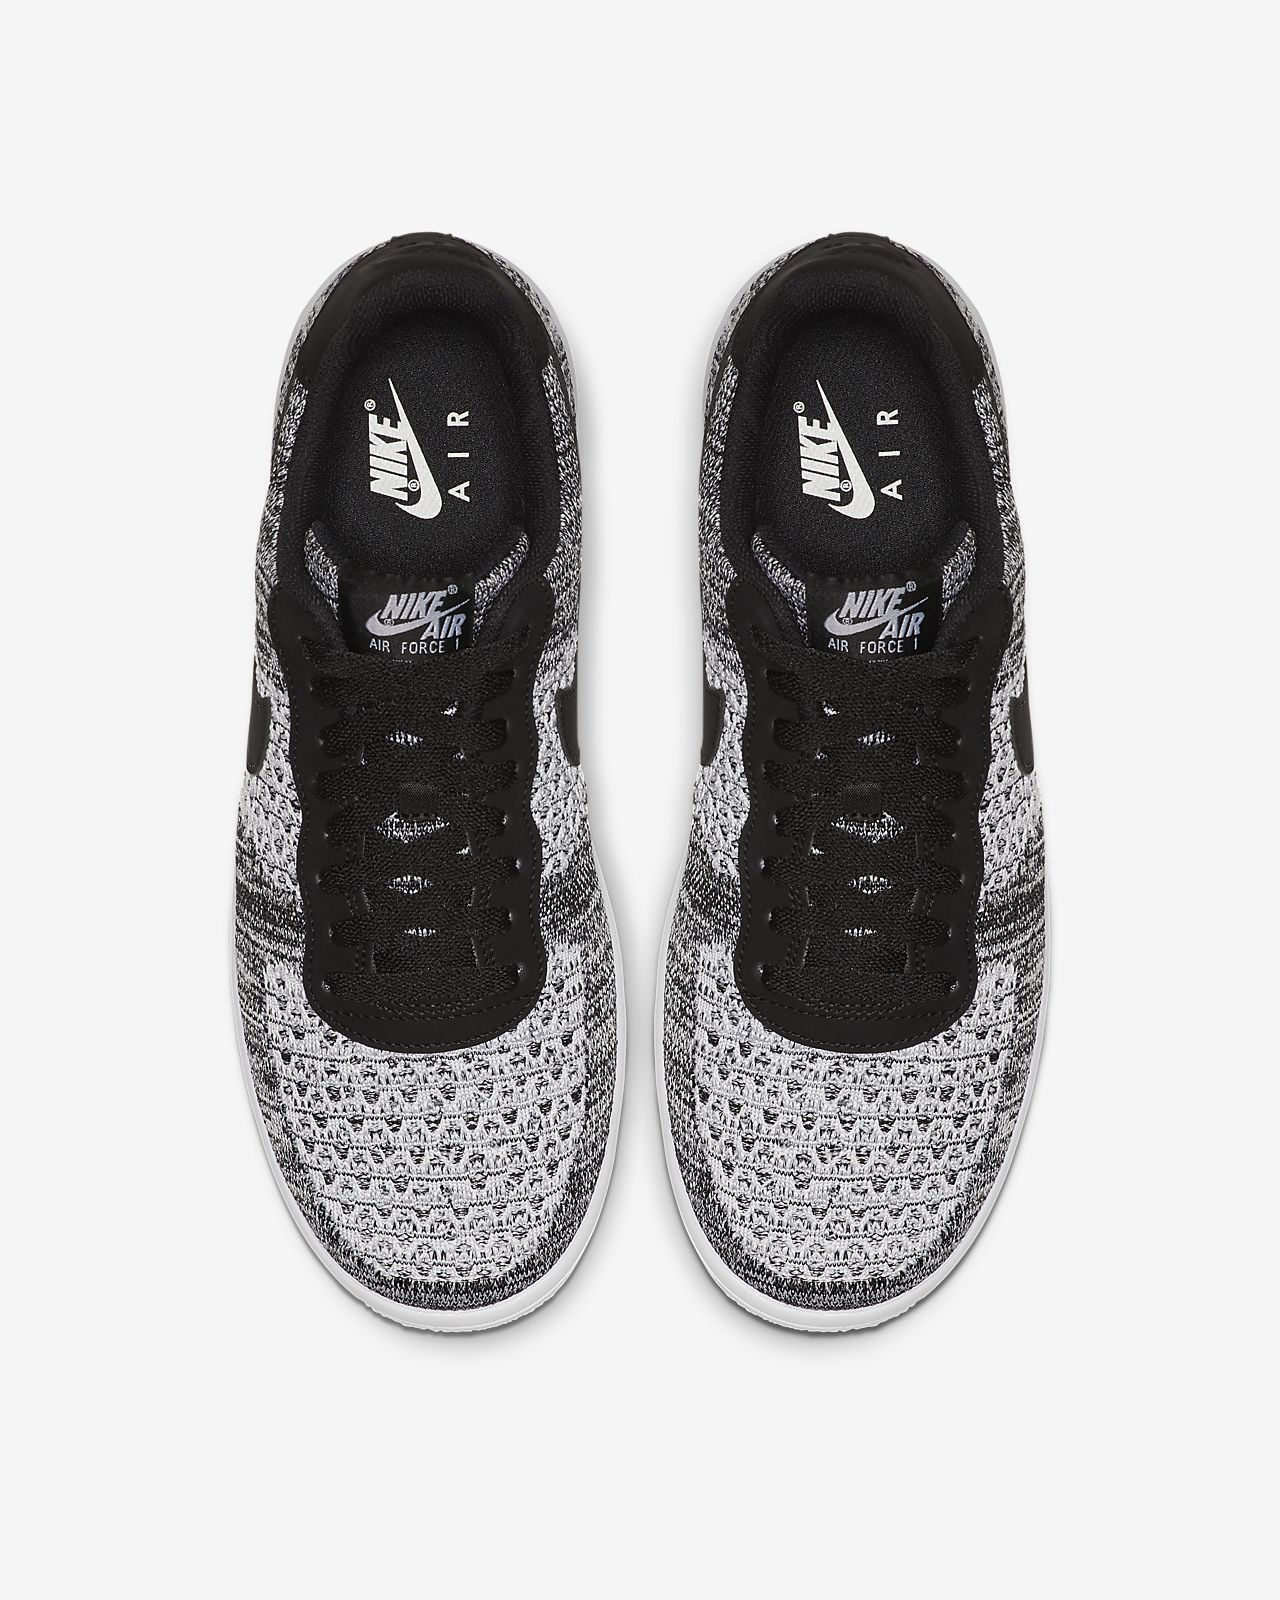 0 Force Flyknit Nike Chaussure 2 1 Air HI9W2ED